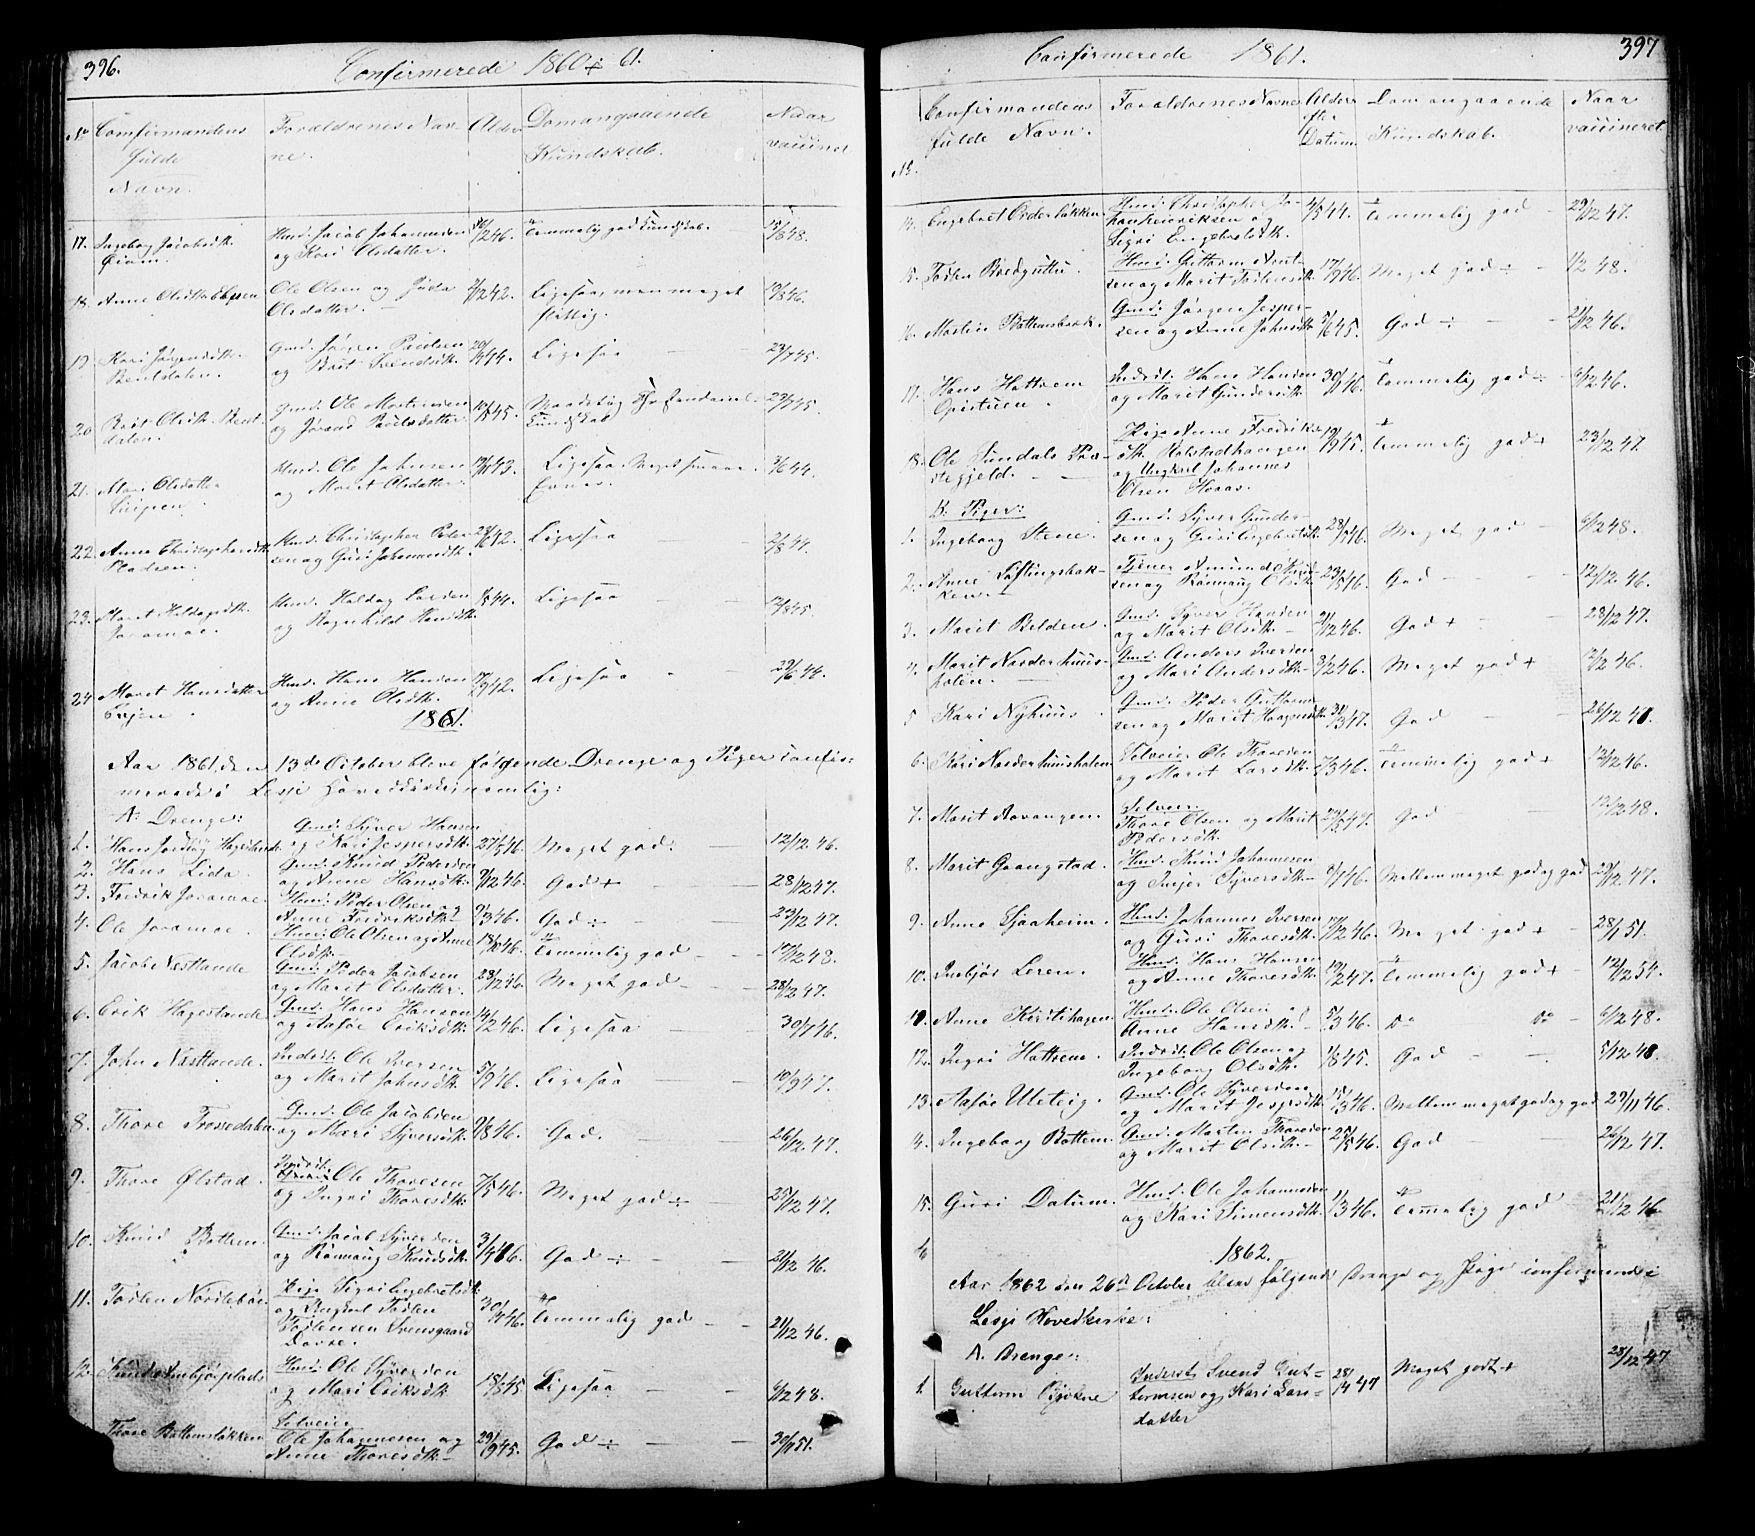 SAH, Lesja prestekontor, Klokkerbok nr. 5, 1850-1894, s. 396-397